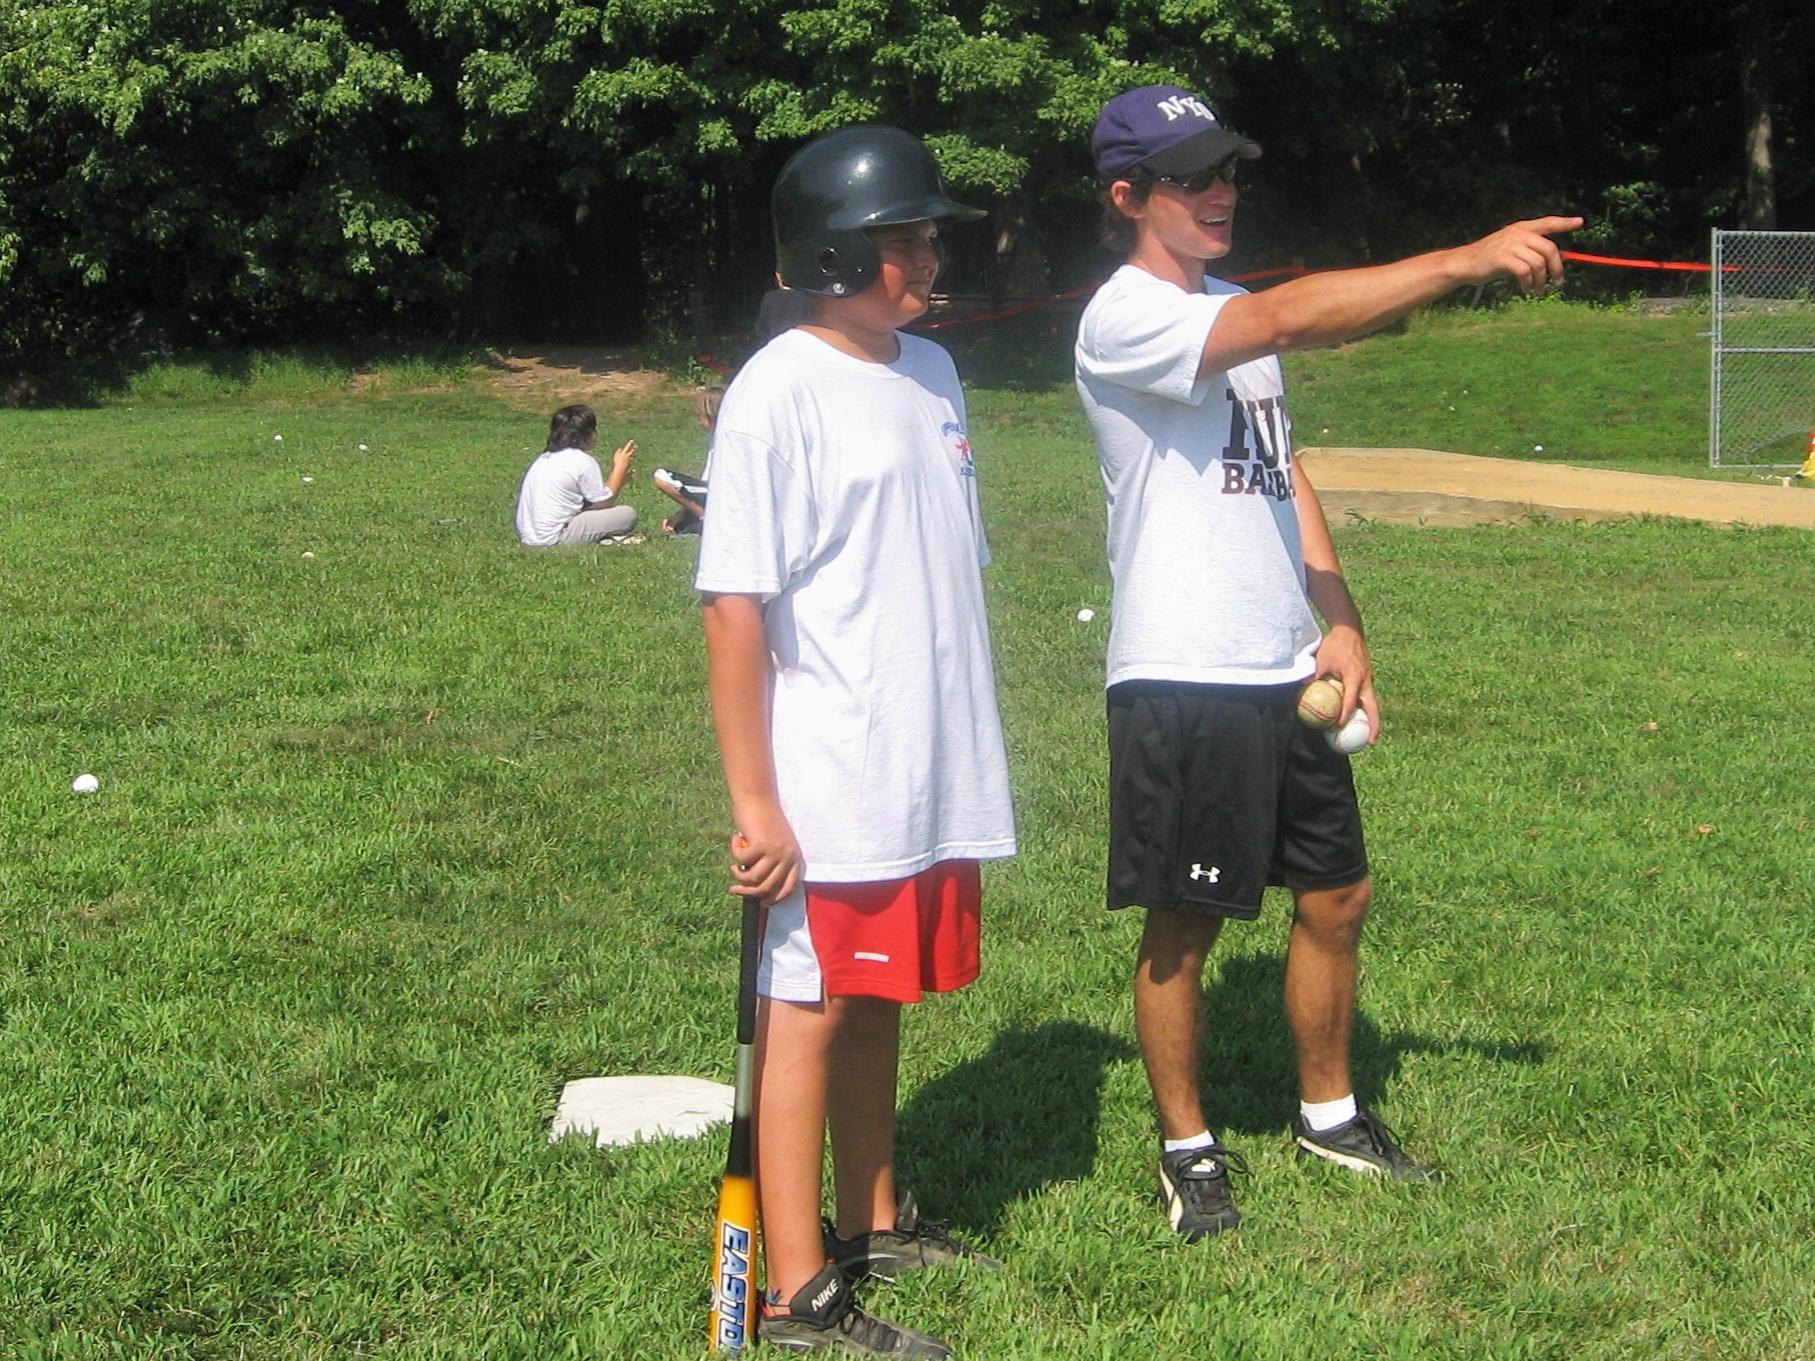 Summer Program - Baseball | The Hun School of Princeton Baseball Camps